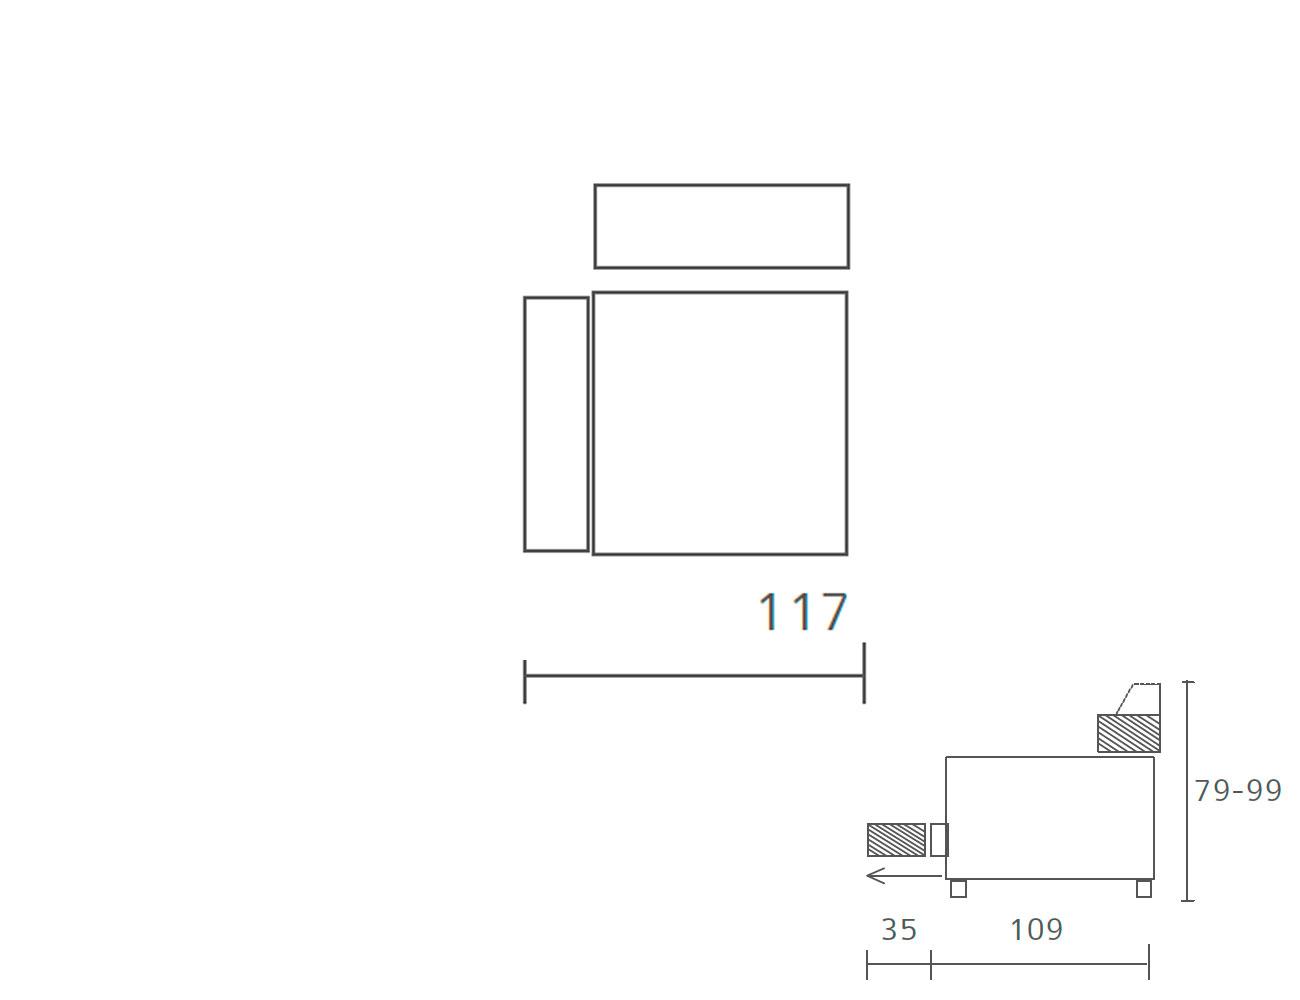 Sofa piel 1 plaza 1173